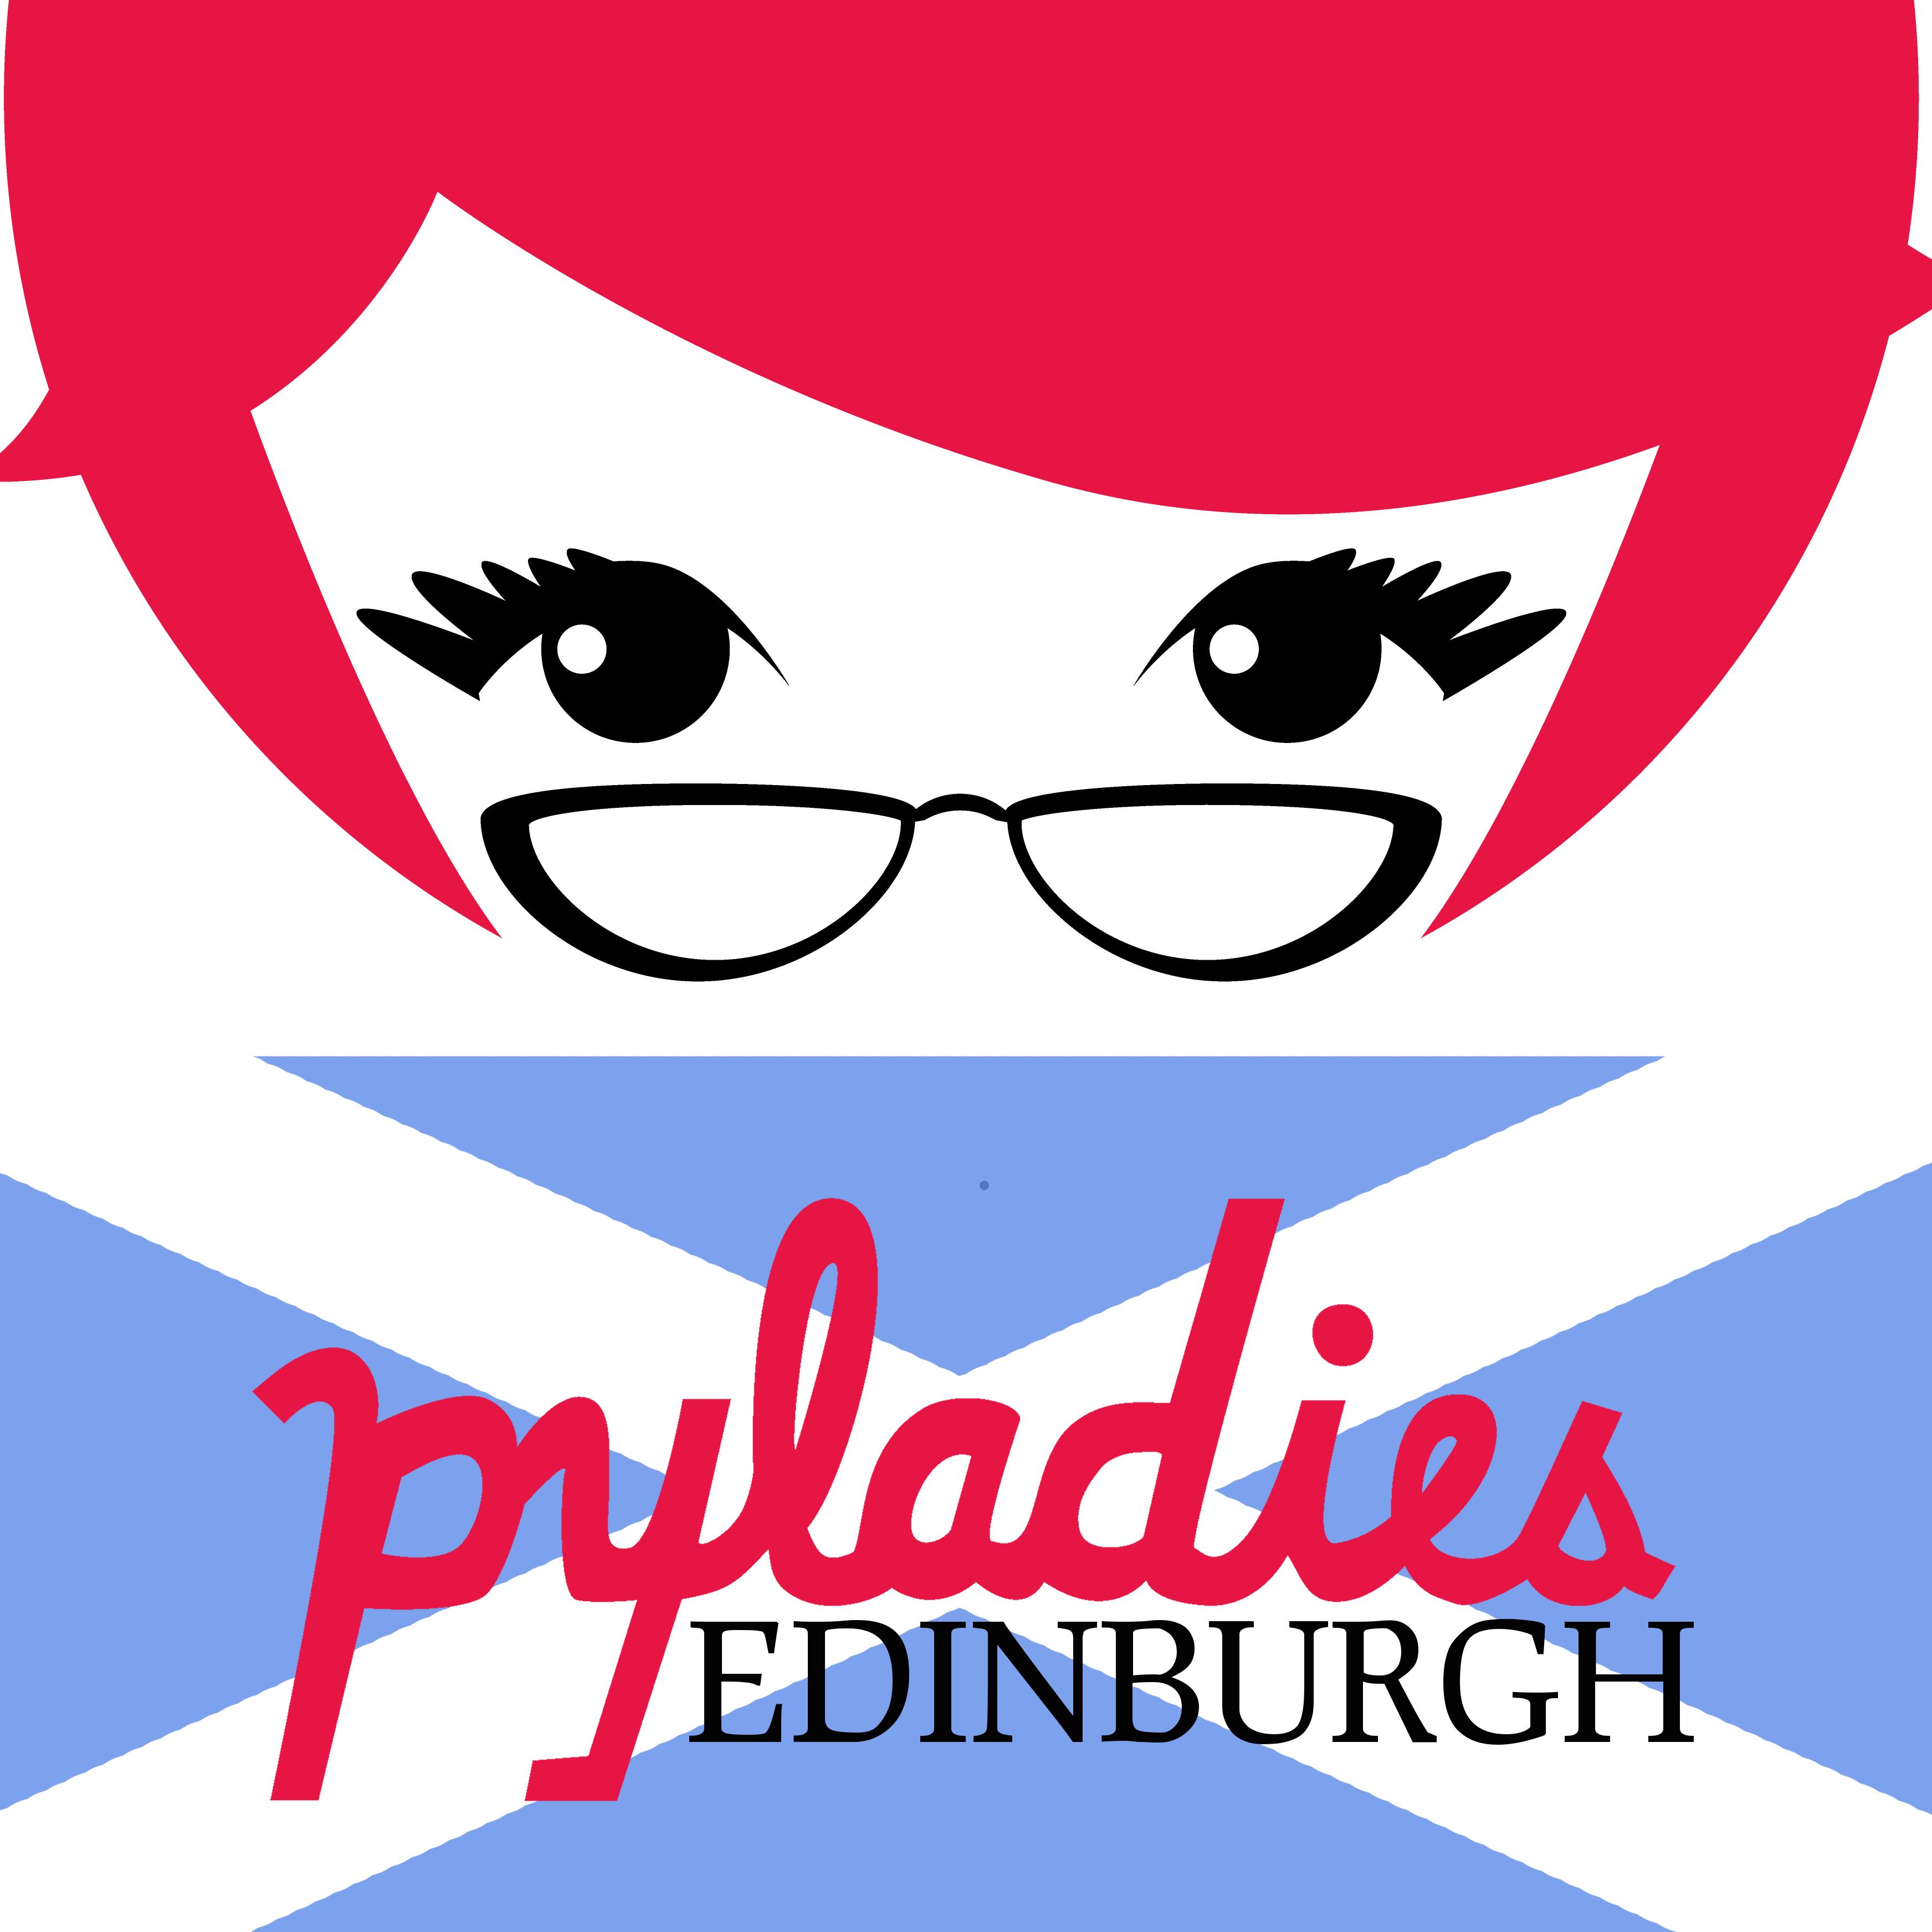 PyLadies Edinburgh